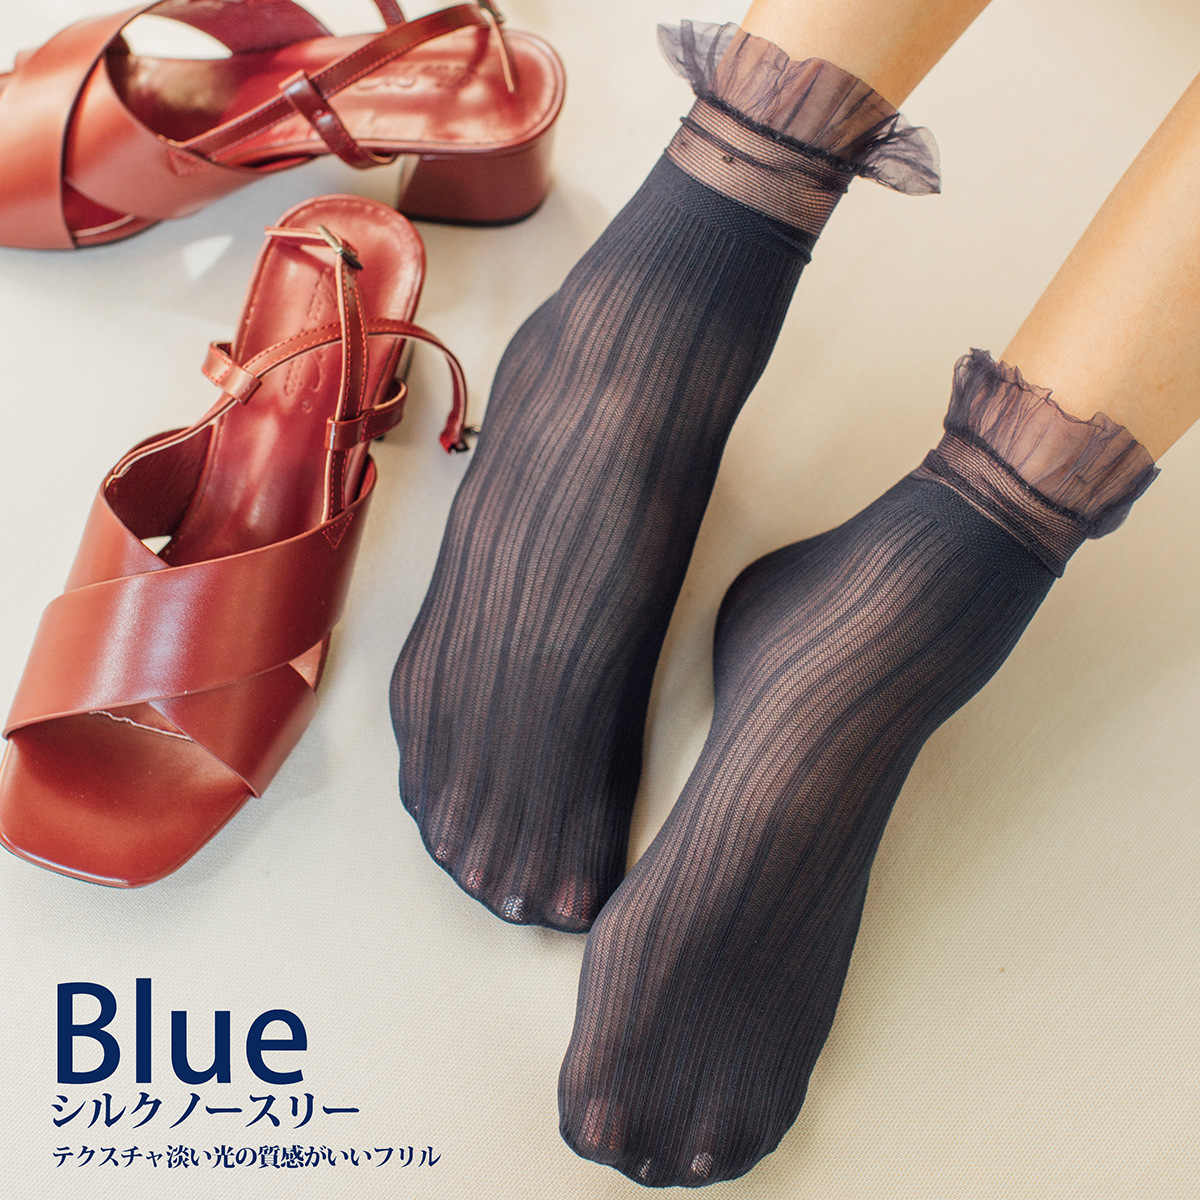 a8b868aa6 Woman Socks 1 Pair 2019 Spring New Fashion Socks Cotton Solid Color Women  Soft Cute Long